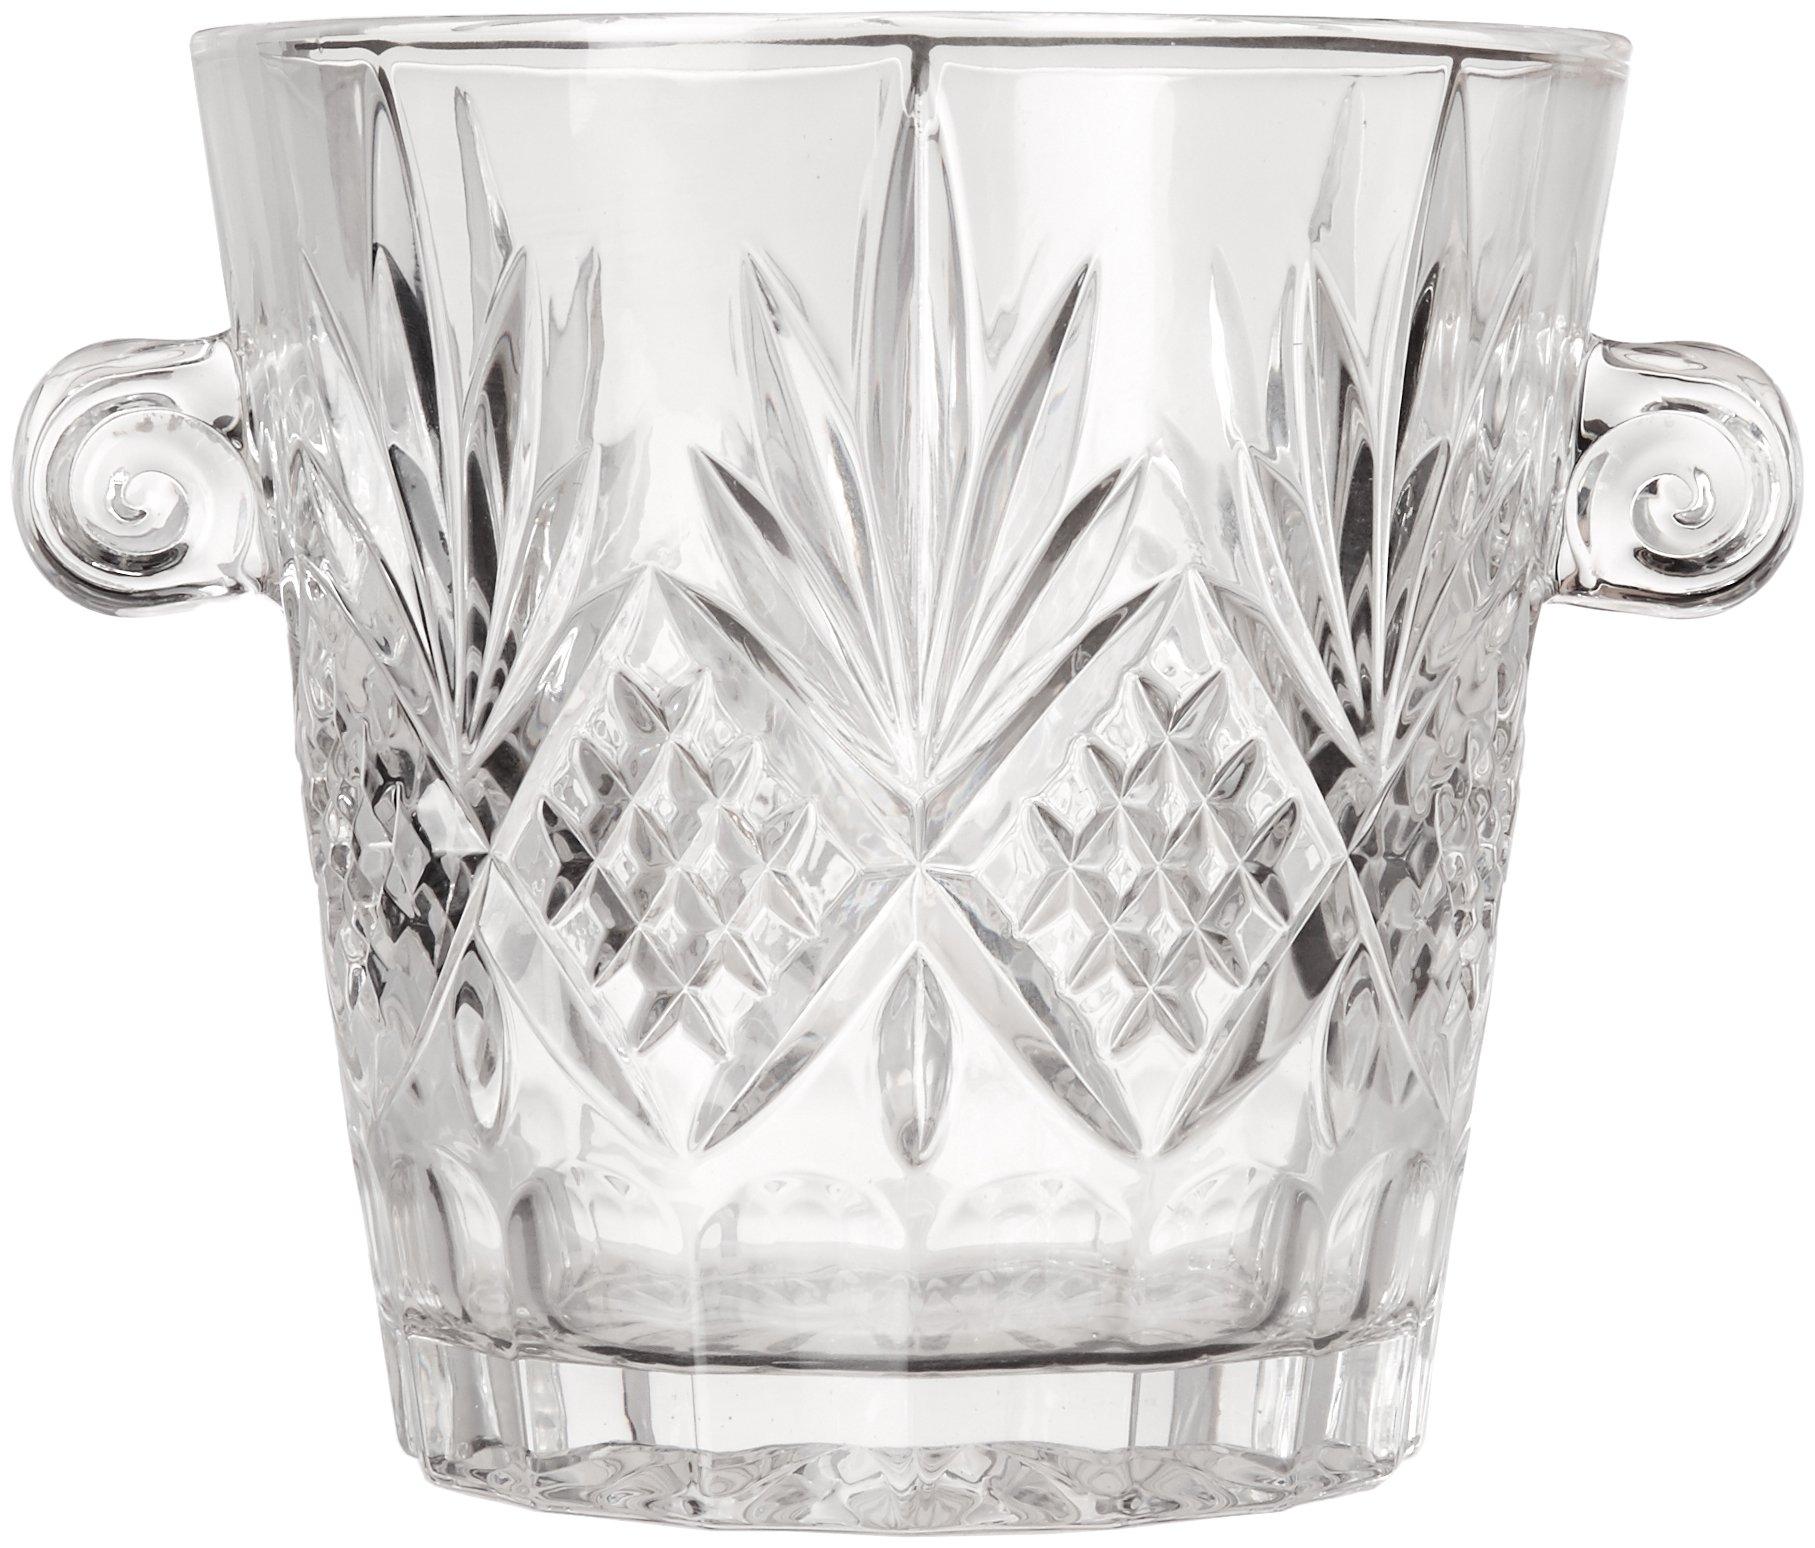 Godinger Dublin Crystal Ice Bucket